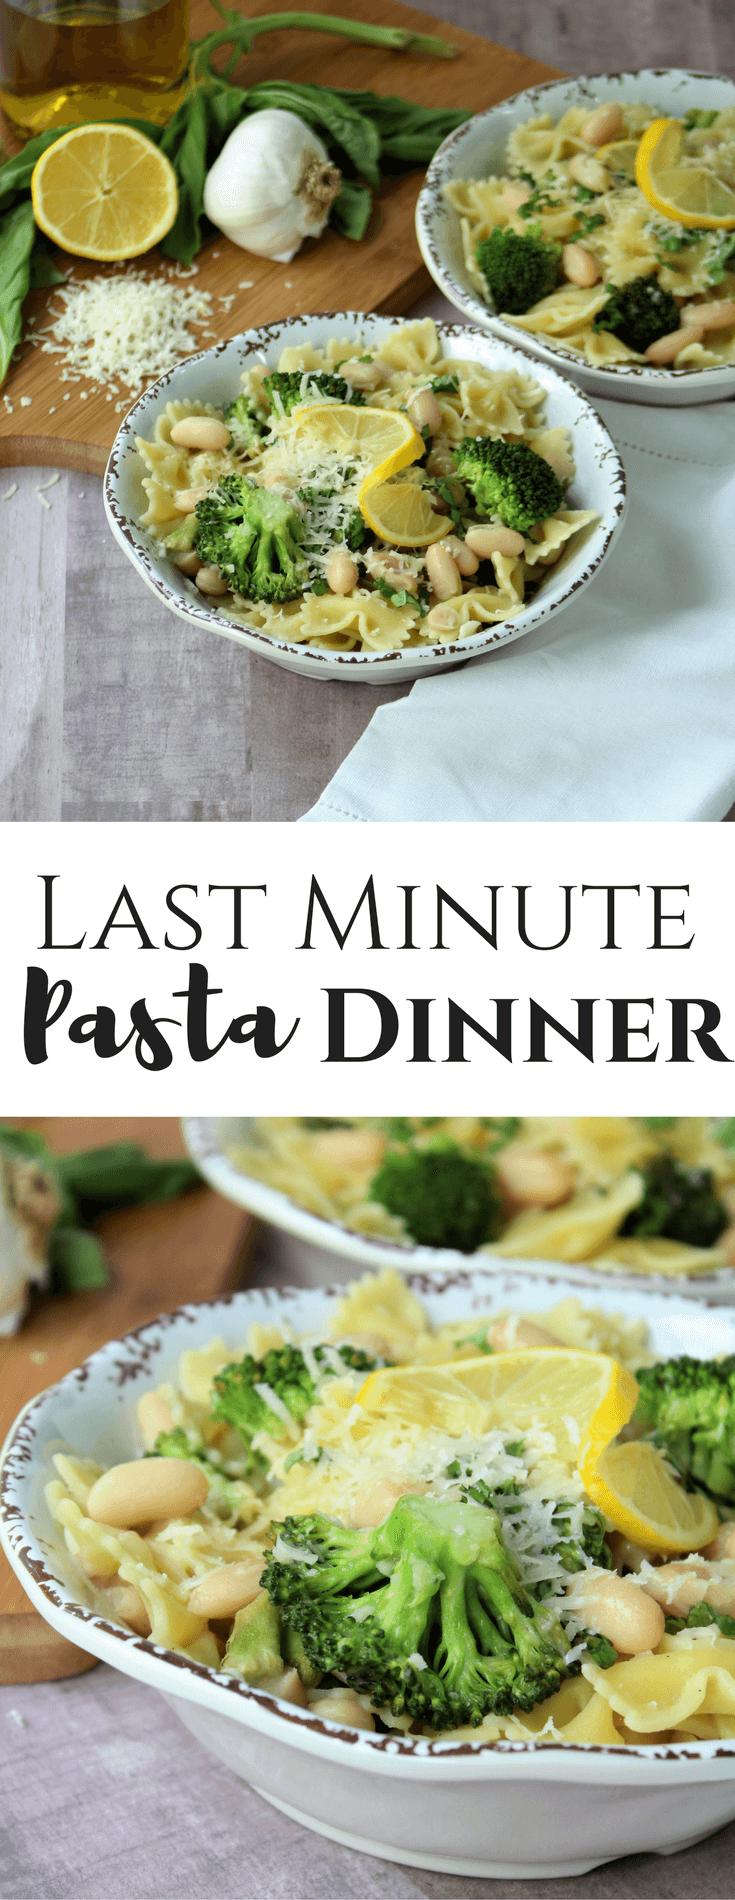 Last Minute Pasta Dinner